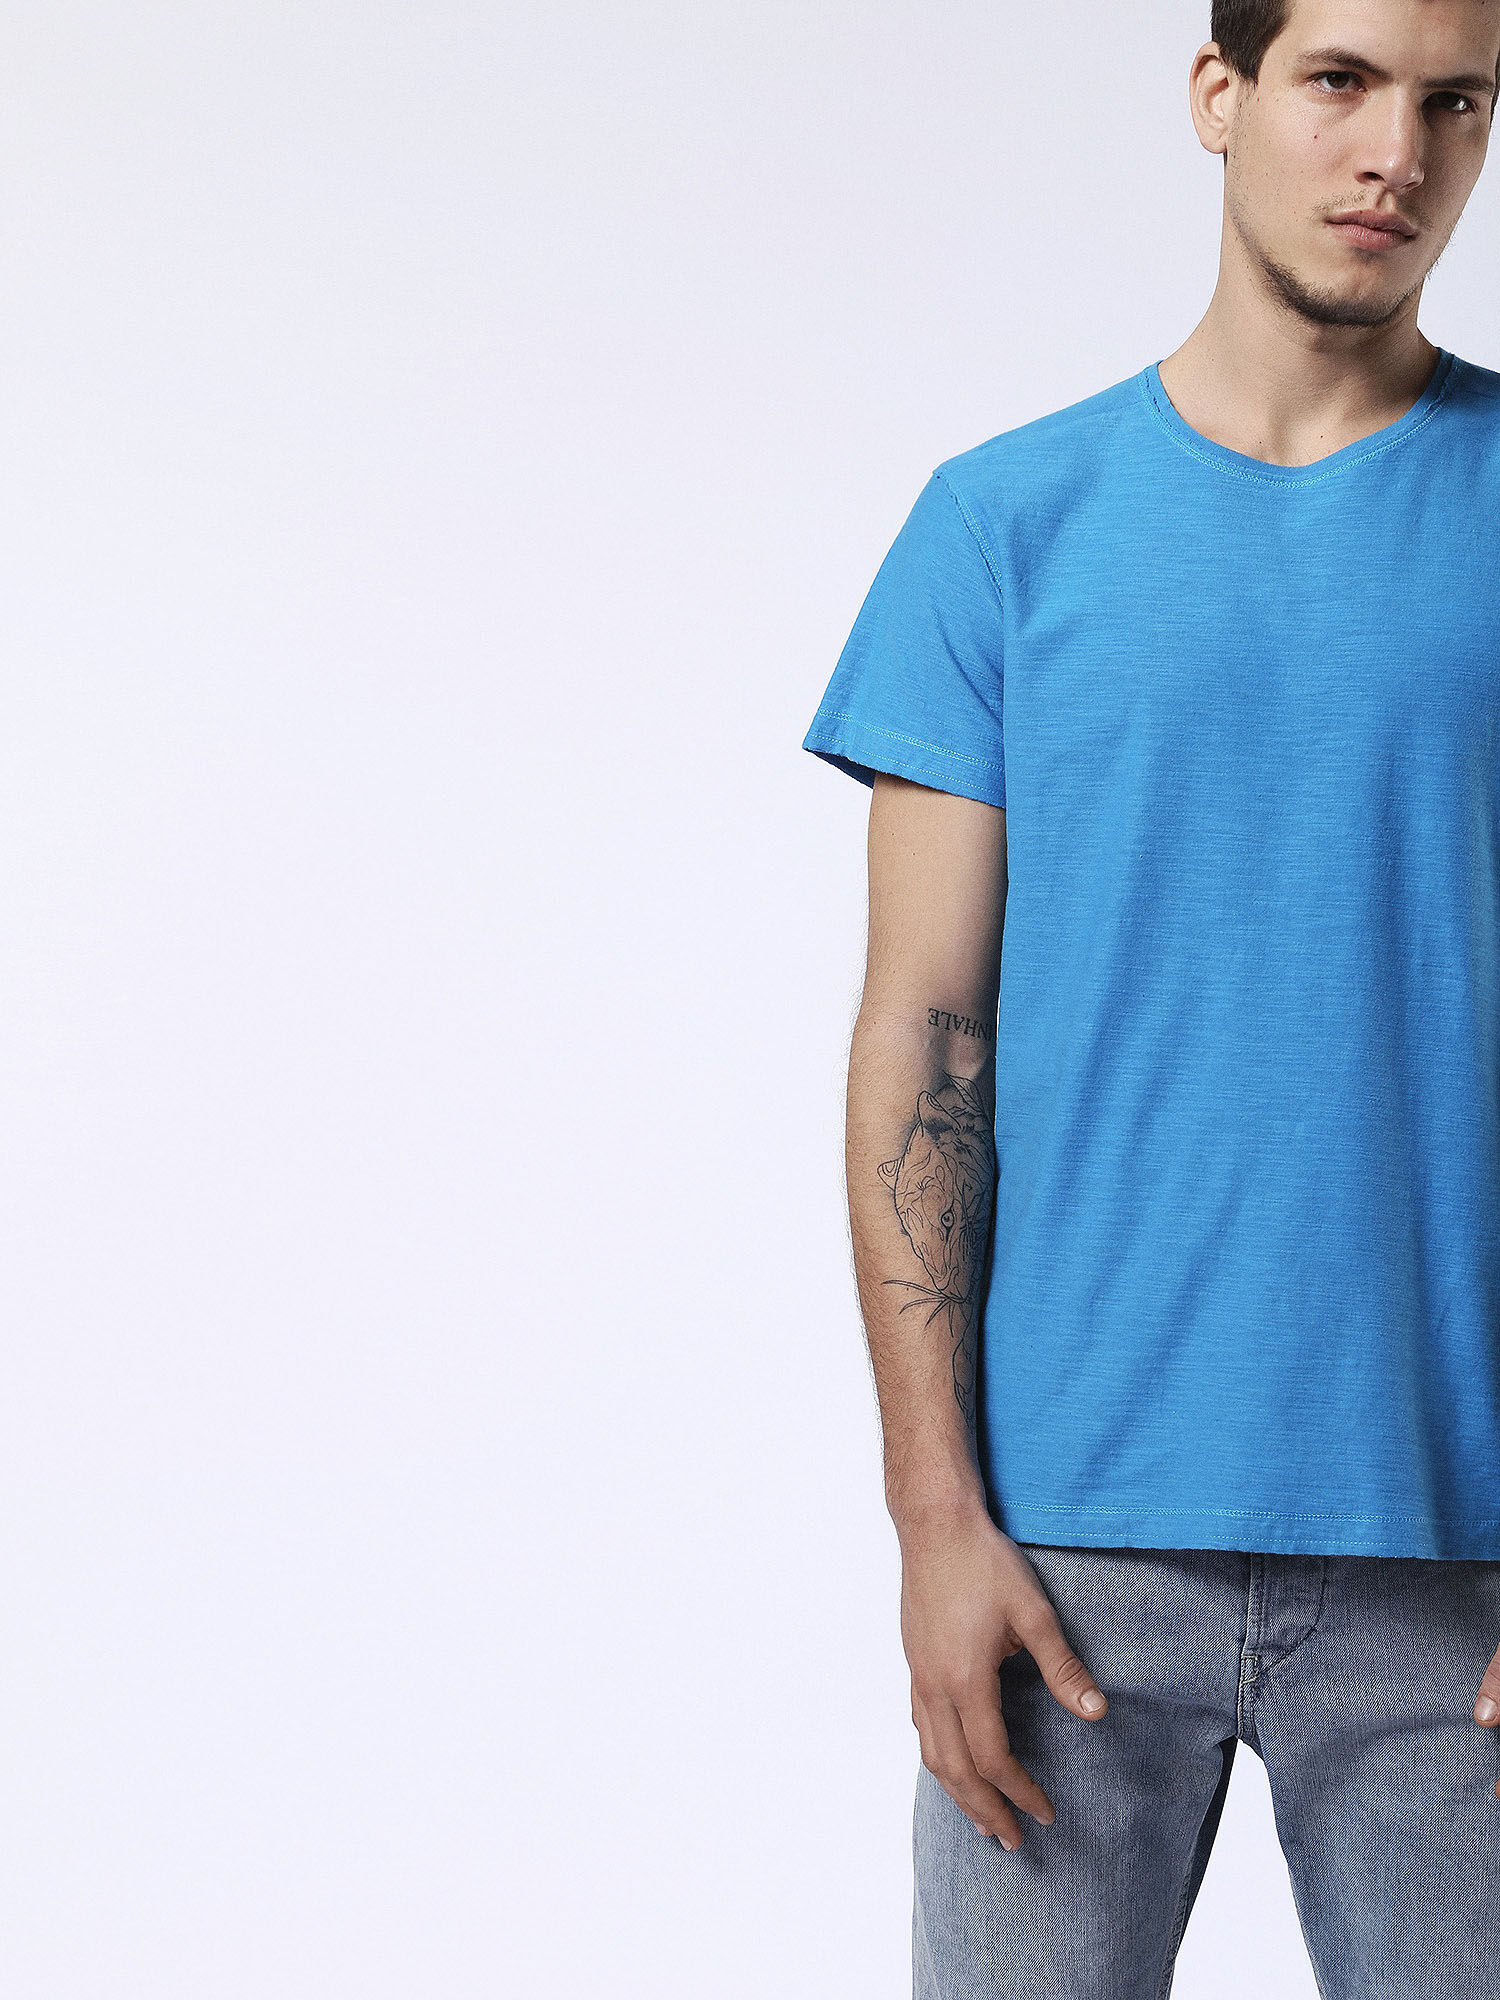 00SRFL00KDY T-Shirts Man T-KNAK by Diesel Skyway